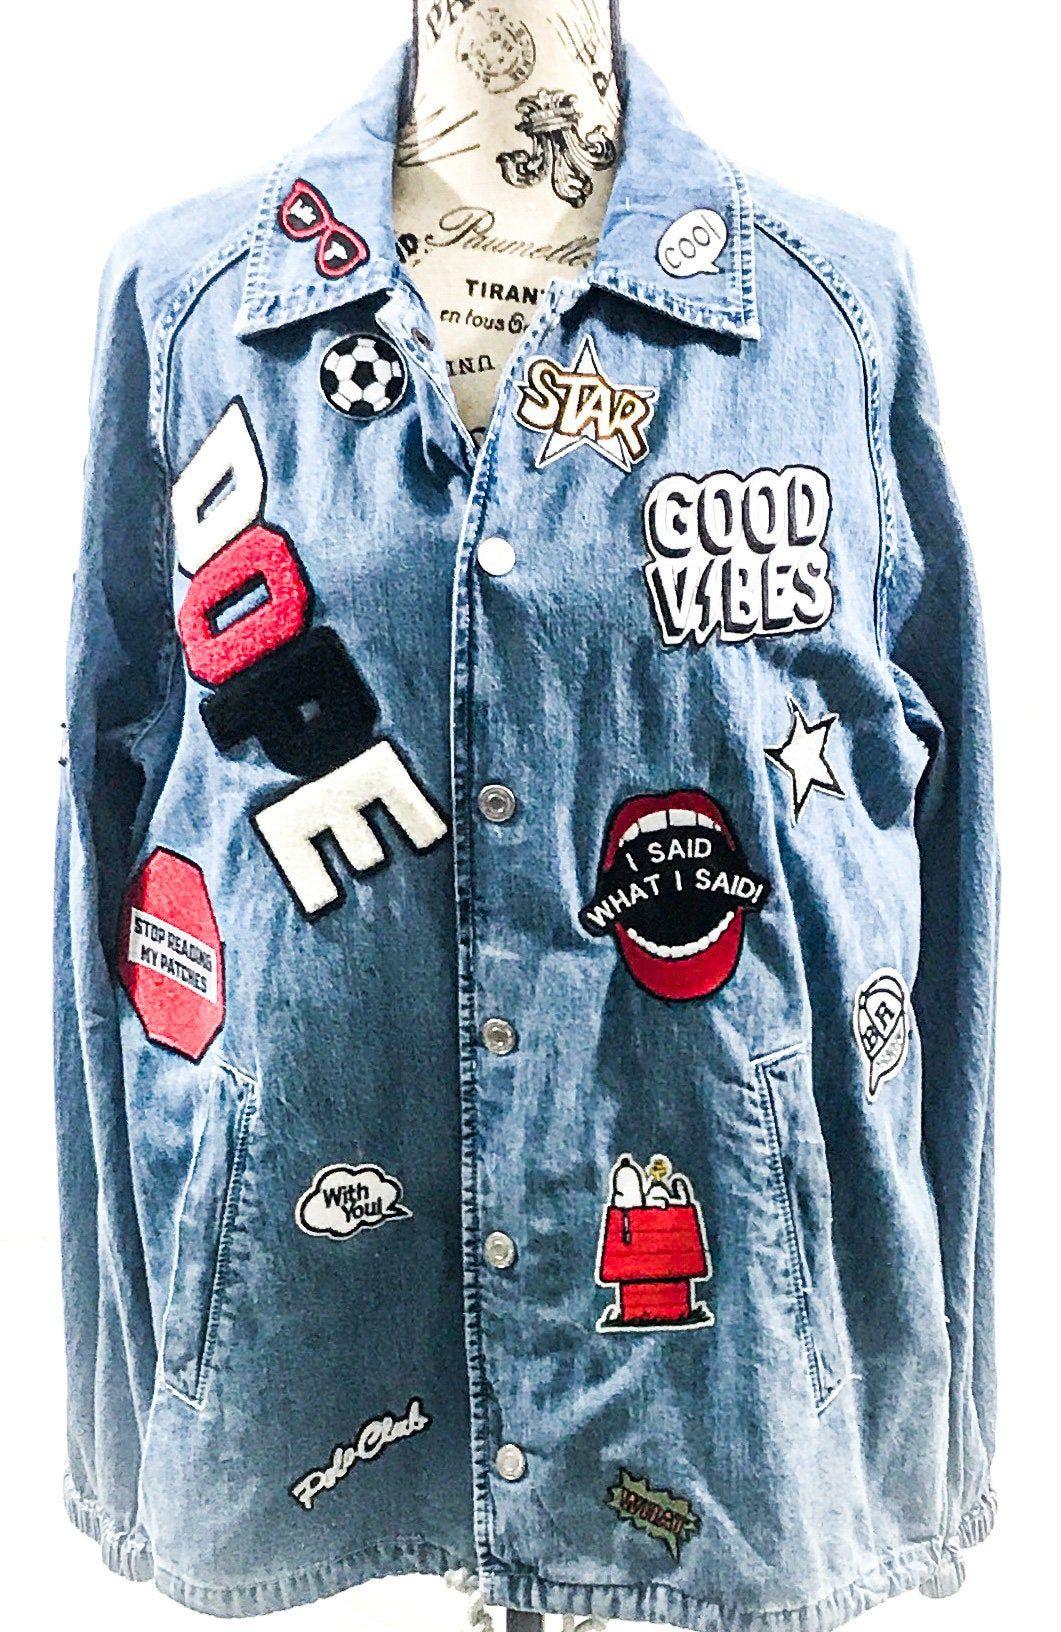 Rock Patch Jacket Rock Band Customized Jacket Coach Jacket Embroidered Patch Denim Jacket Rock And Roll Jacket Denim Jacket Patches Denim Jacket Patches Jacket [ 1632 x 1061 Pixel ]